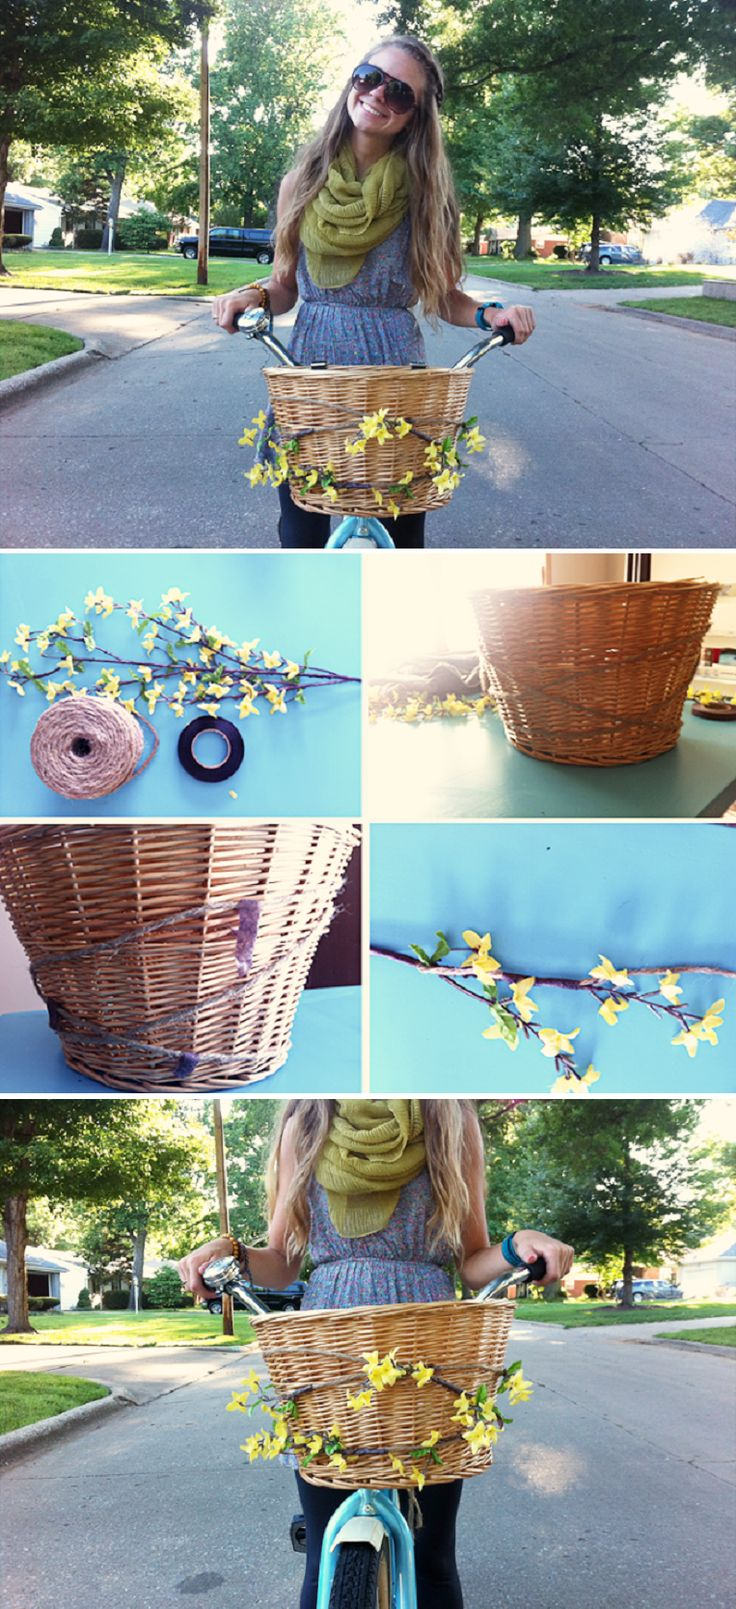 DIY Floral Bike Basket - 15 Chic DIY Ideas to Update Your Bike | GleamItUp